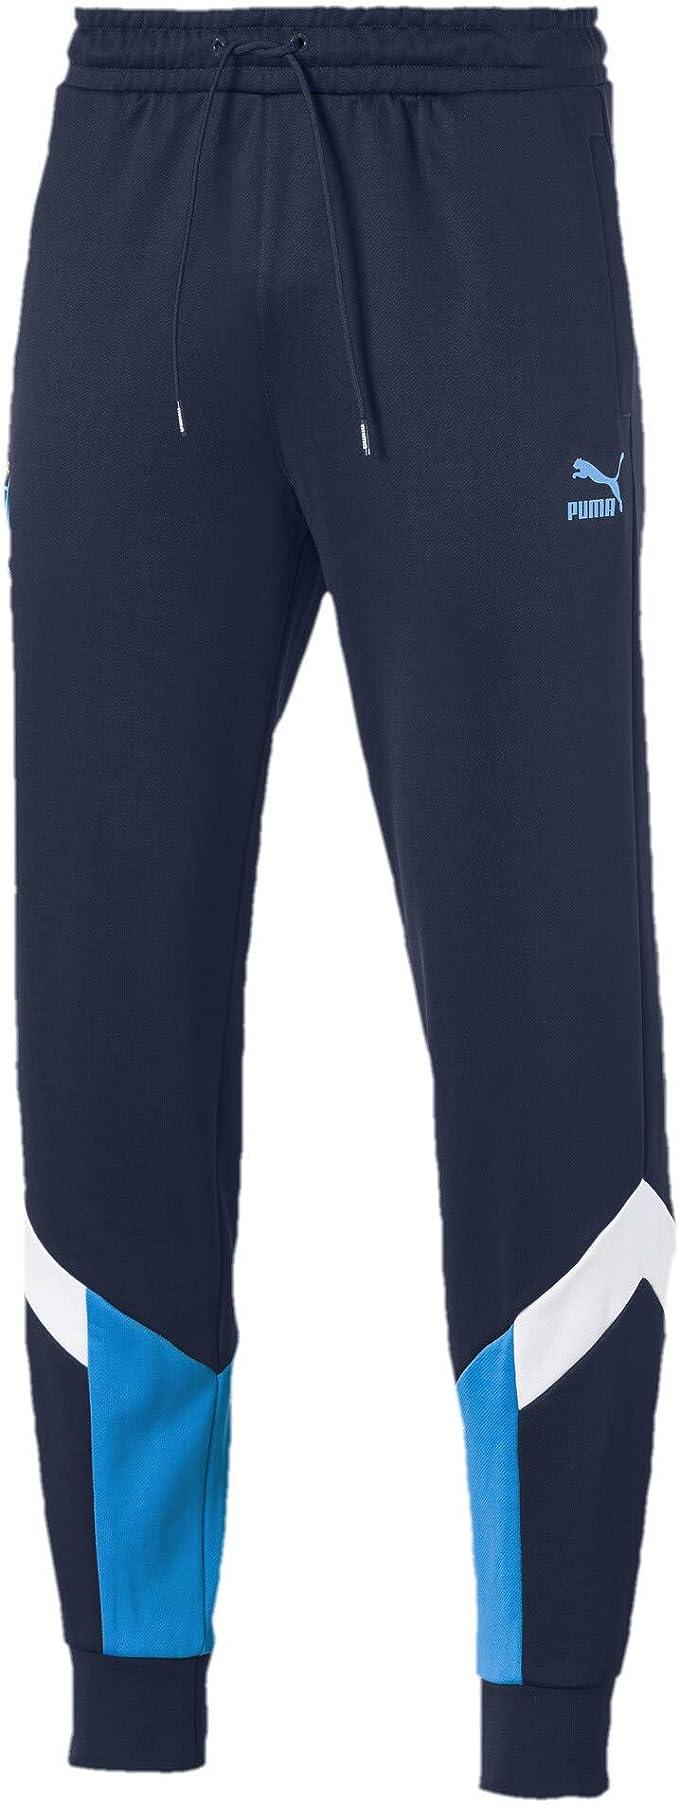 PUMA Herren Jogginghose OM Iconic MCS Track Pants: